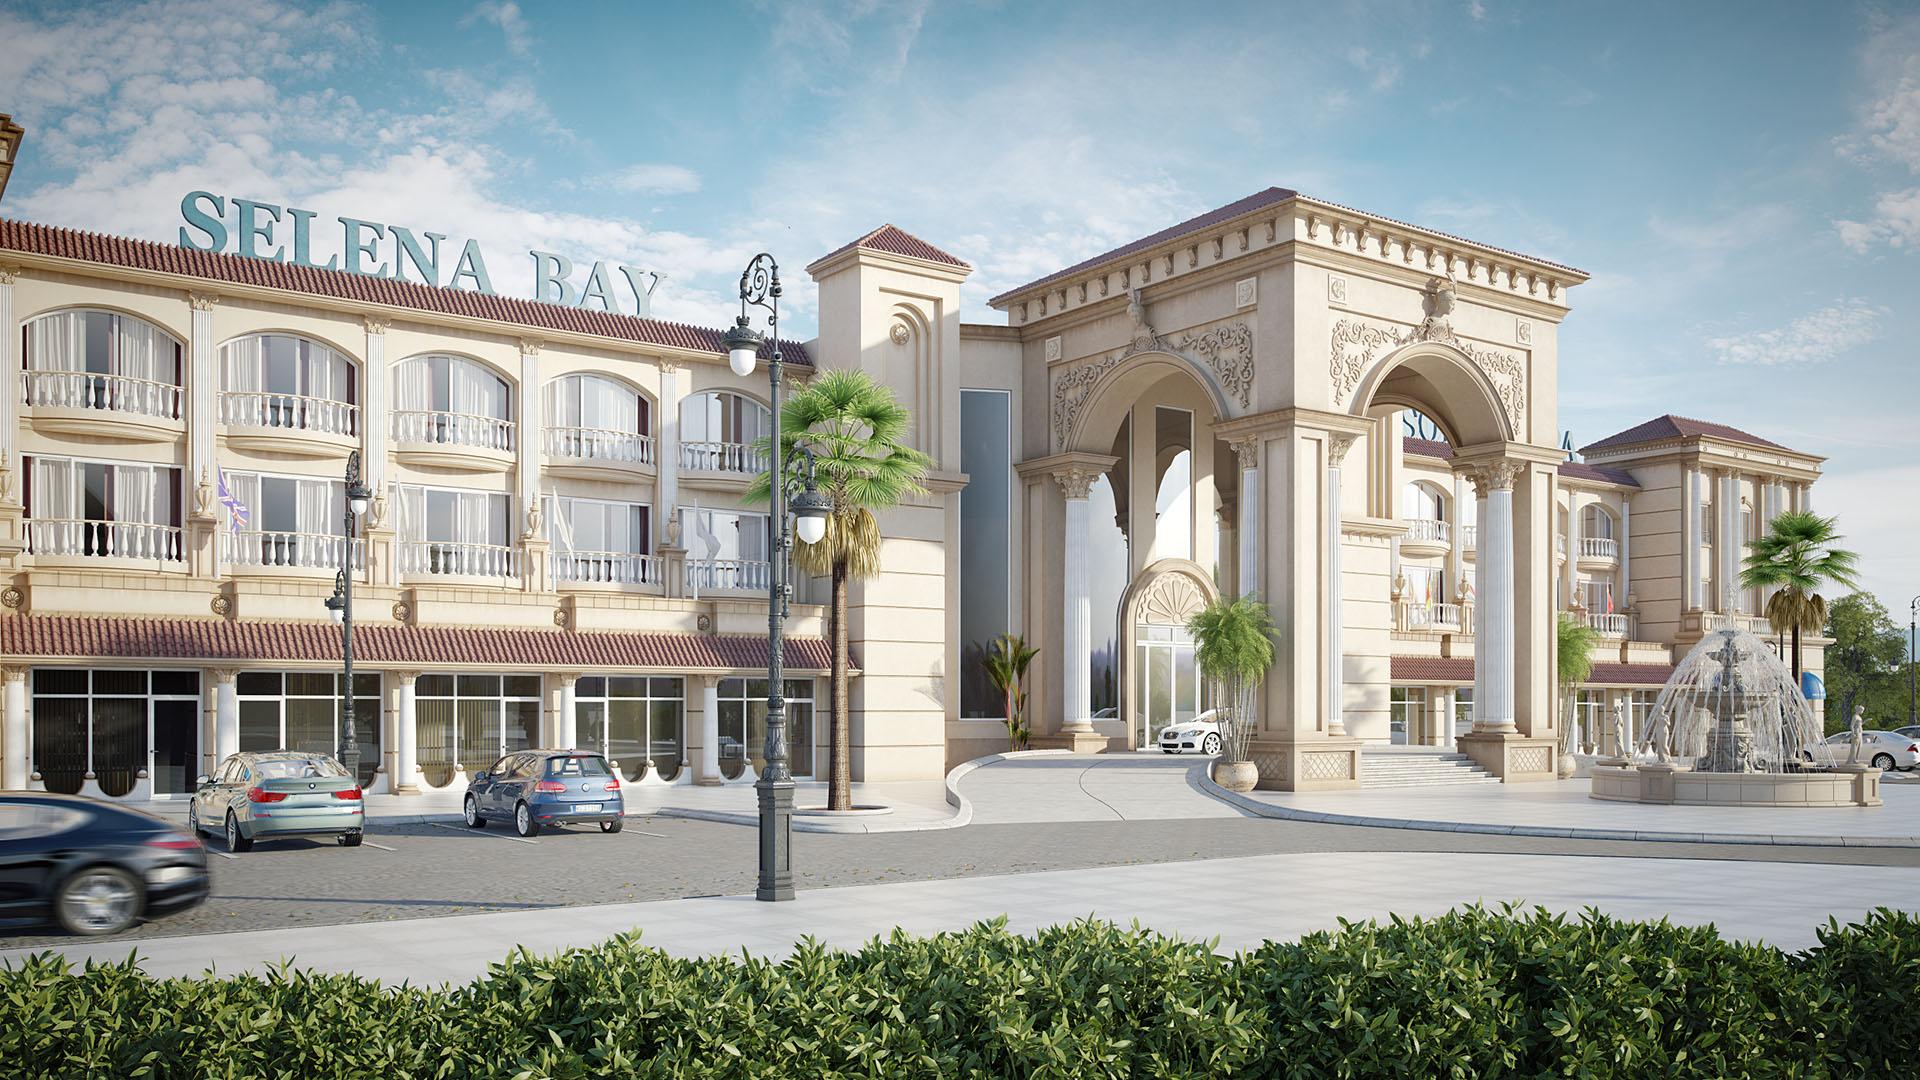 Taher Design Selena Bay Resort (2).jpg